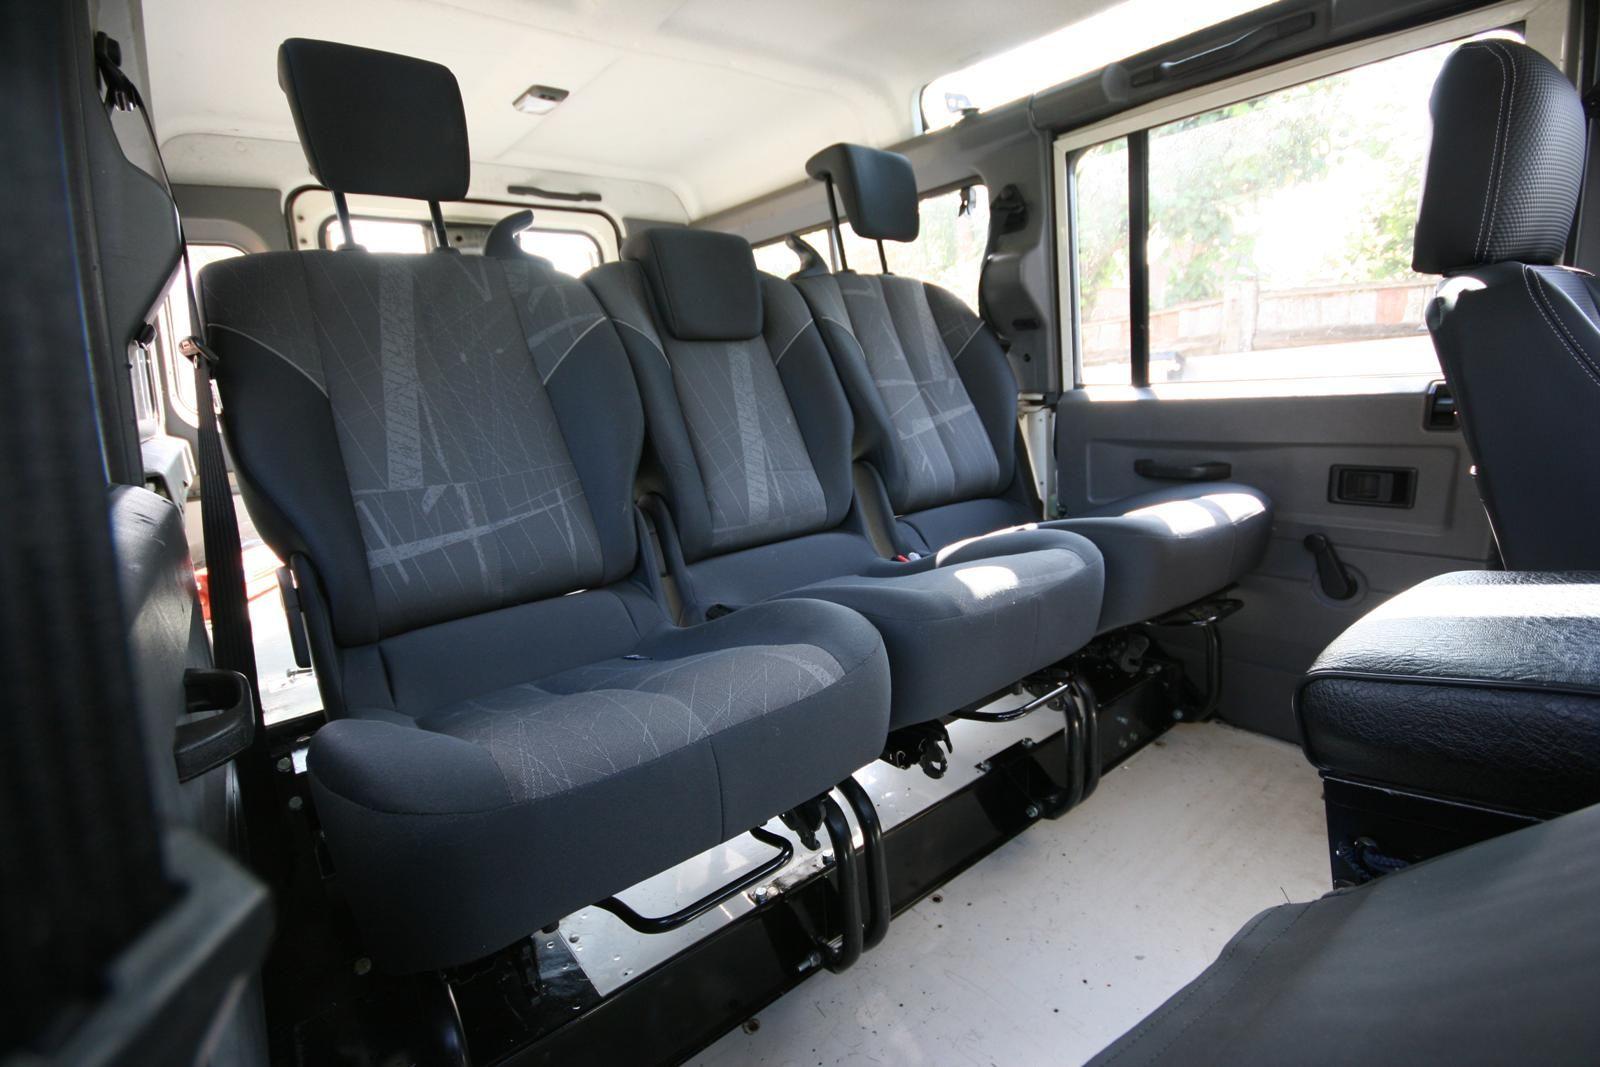 Renault Scenic 2006 Interior